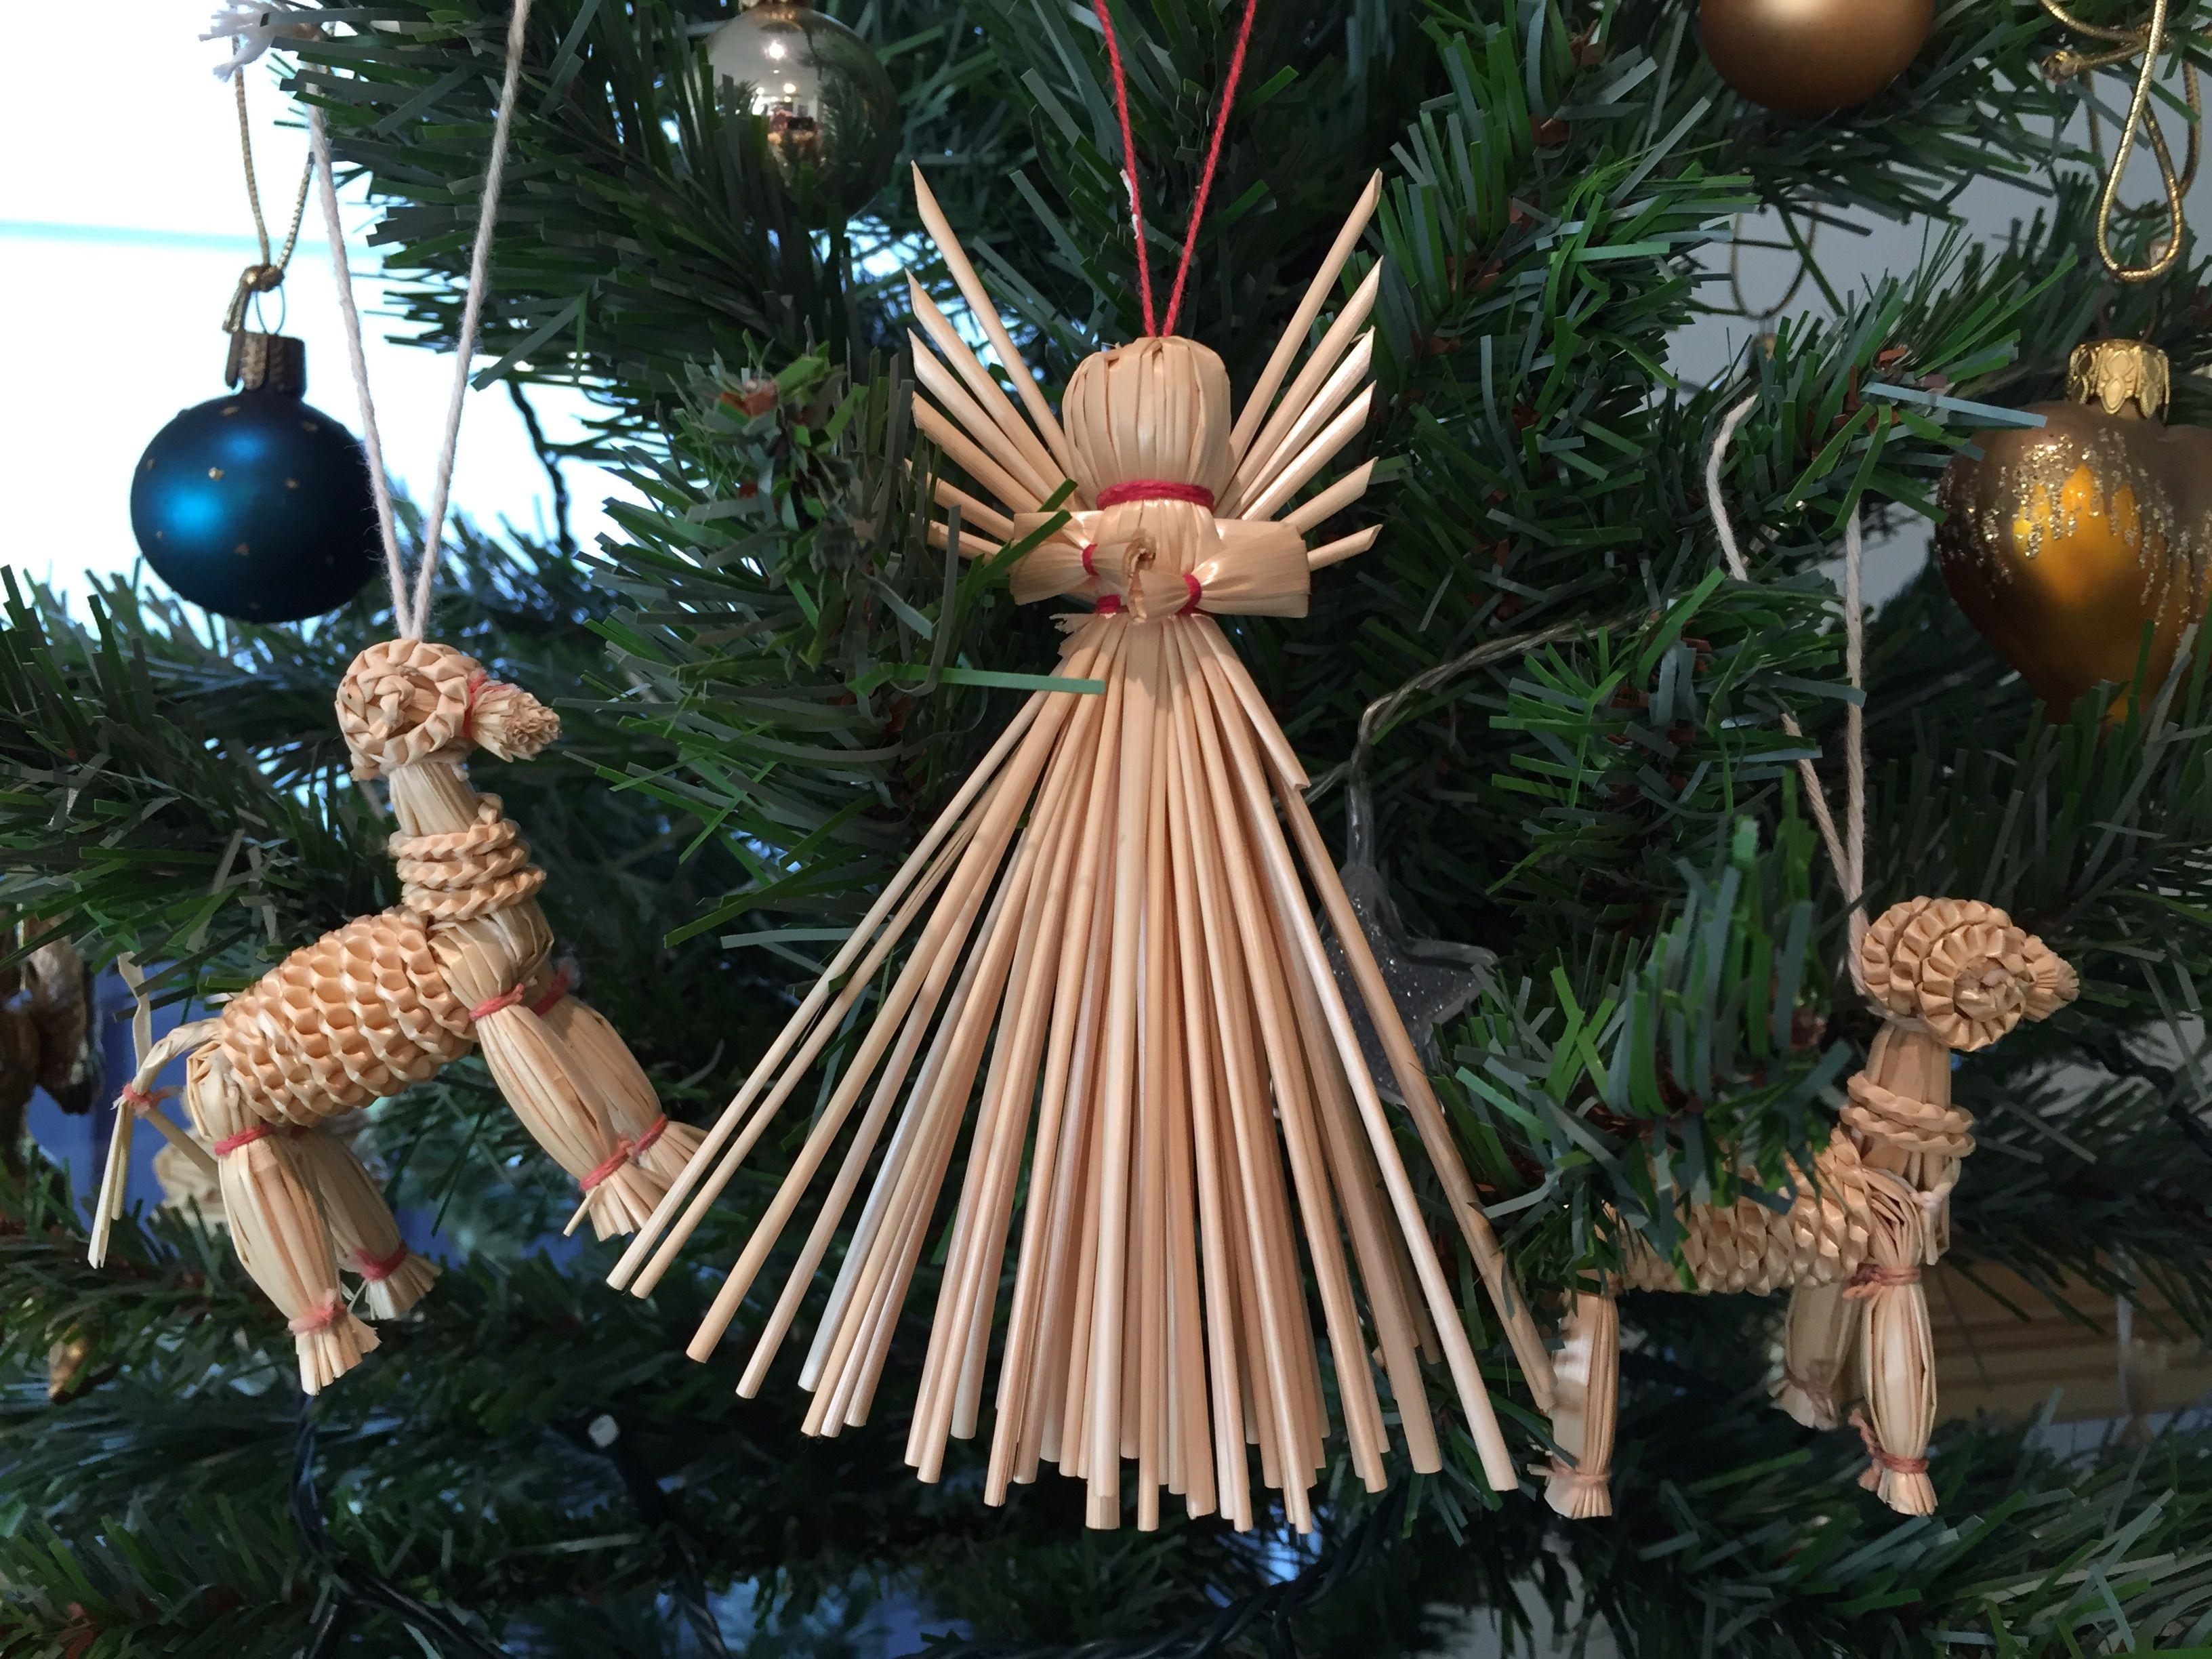 File:Christmas tree decorations of Poland 04.jpeg - Wikimedia Commons